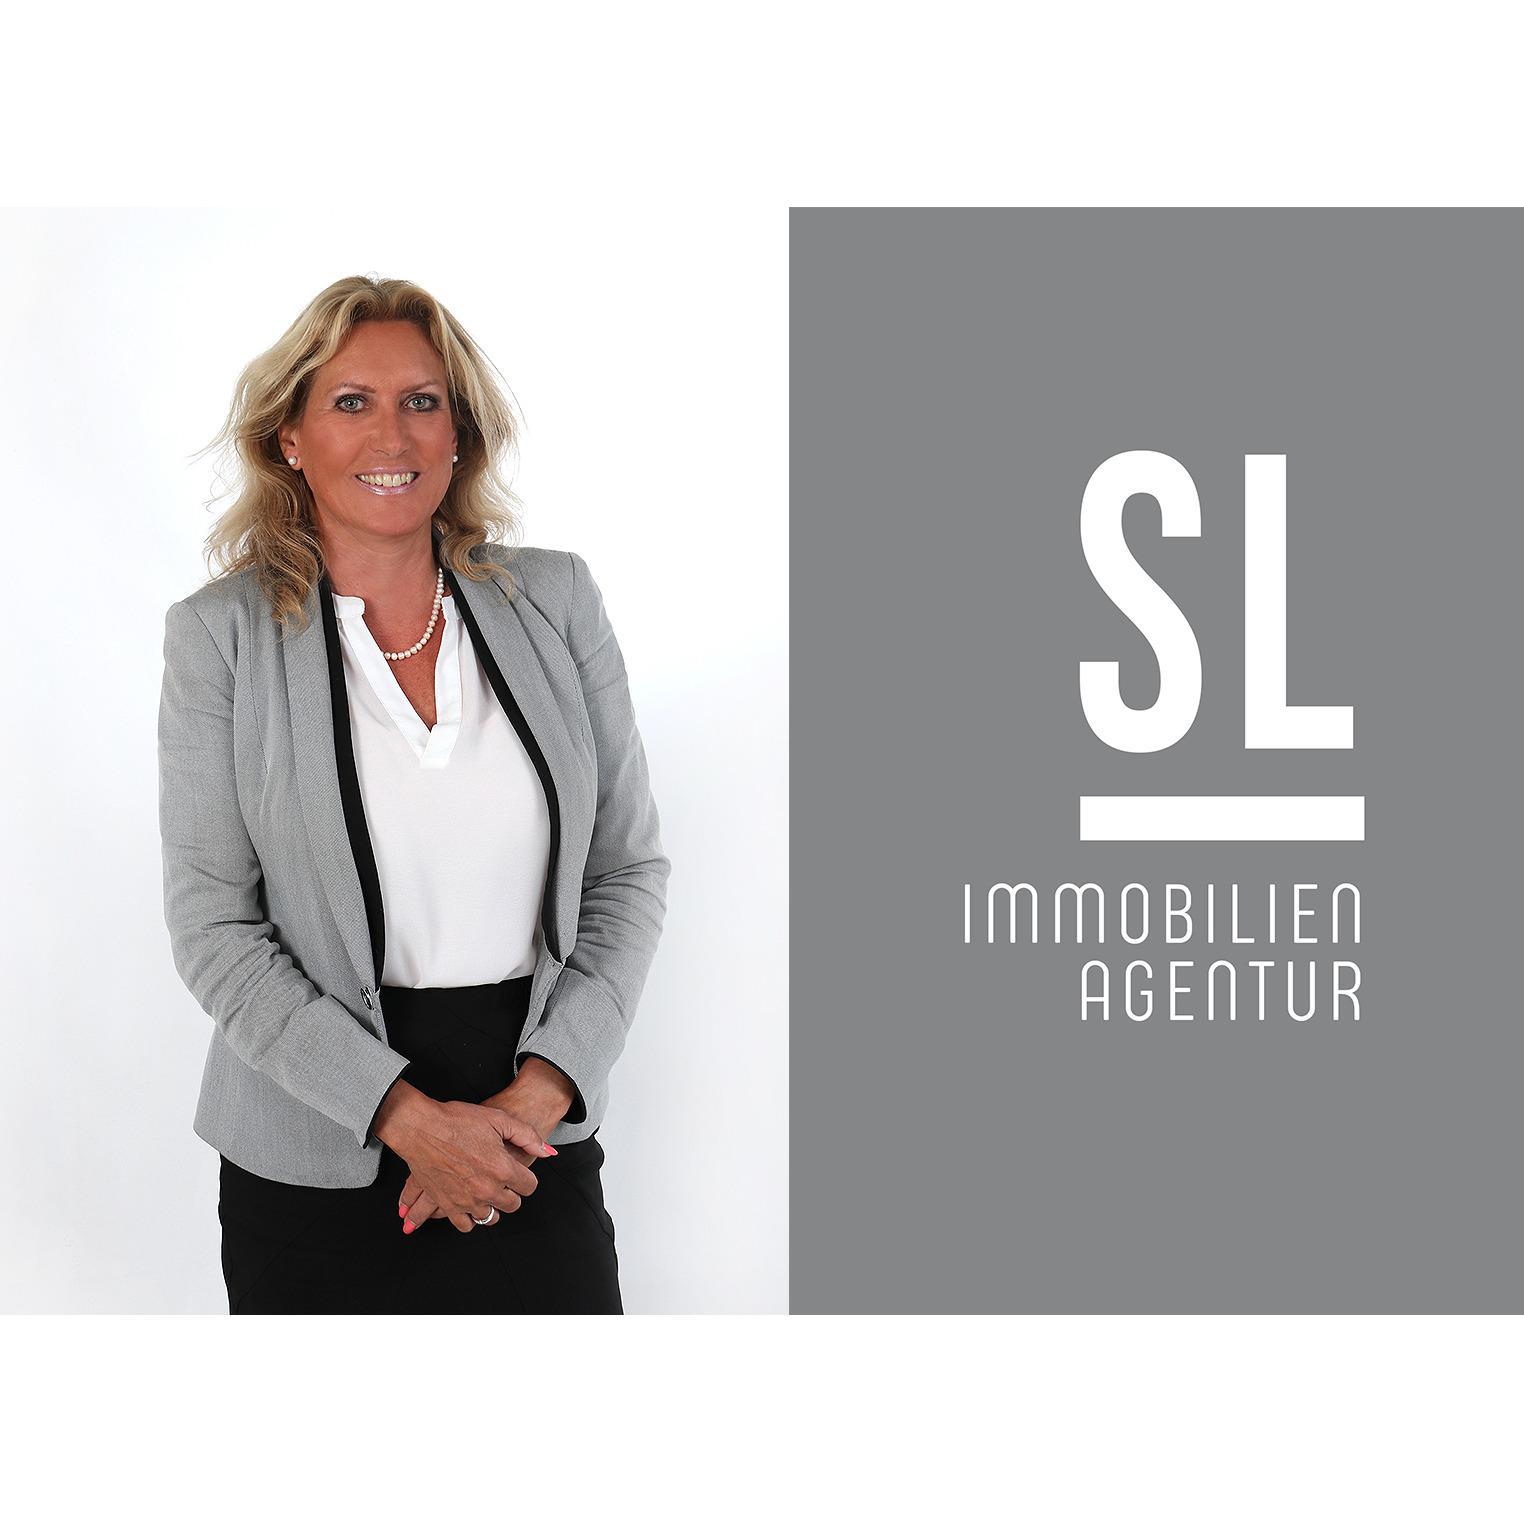 SL Immobilien Agentur - Susanne Lehner